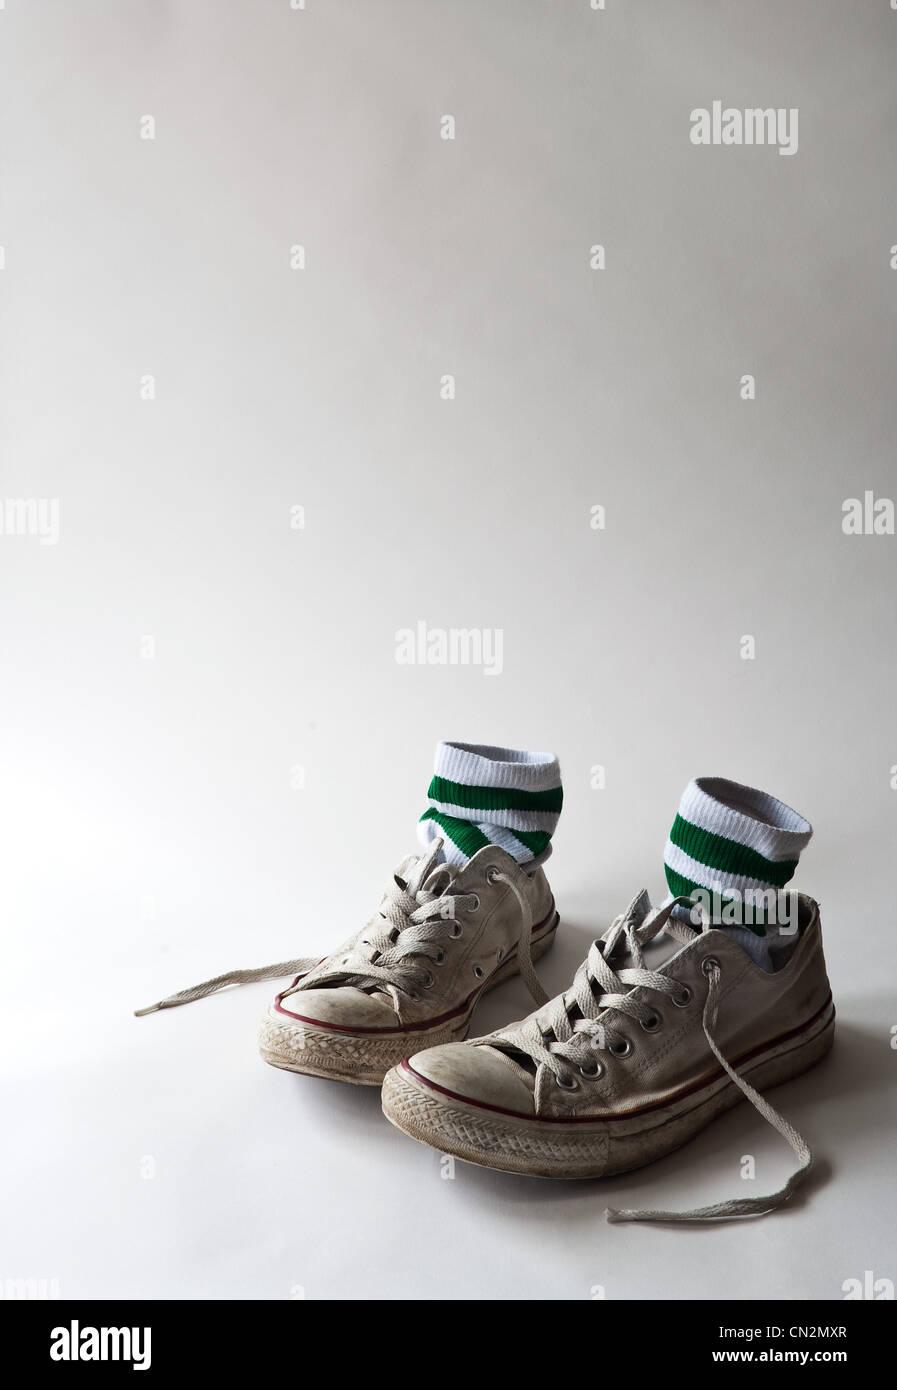 Pair of training shoes and socks, studio shot - Stock Image